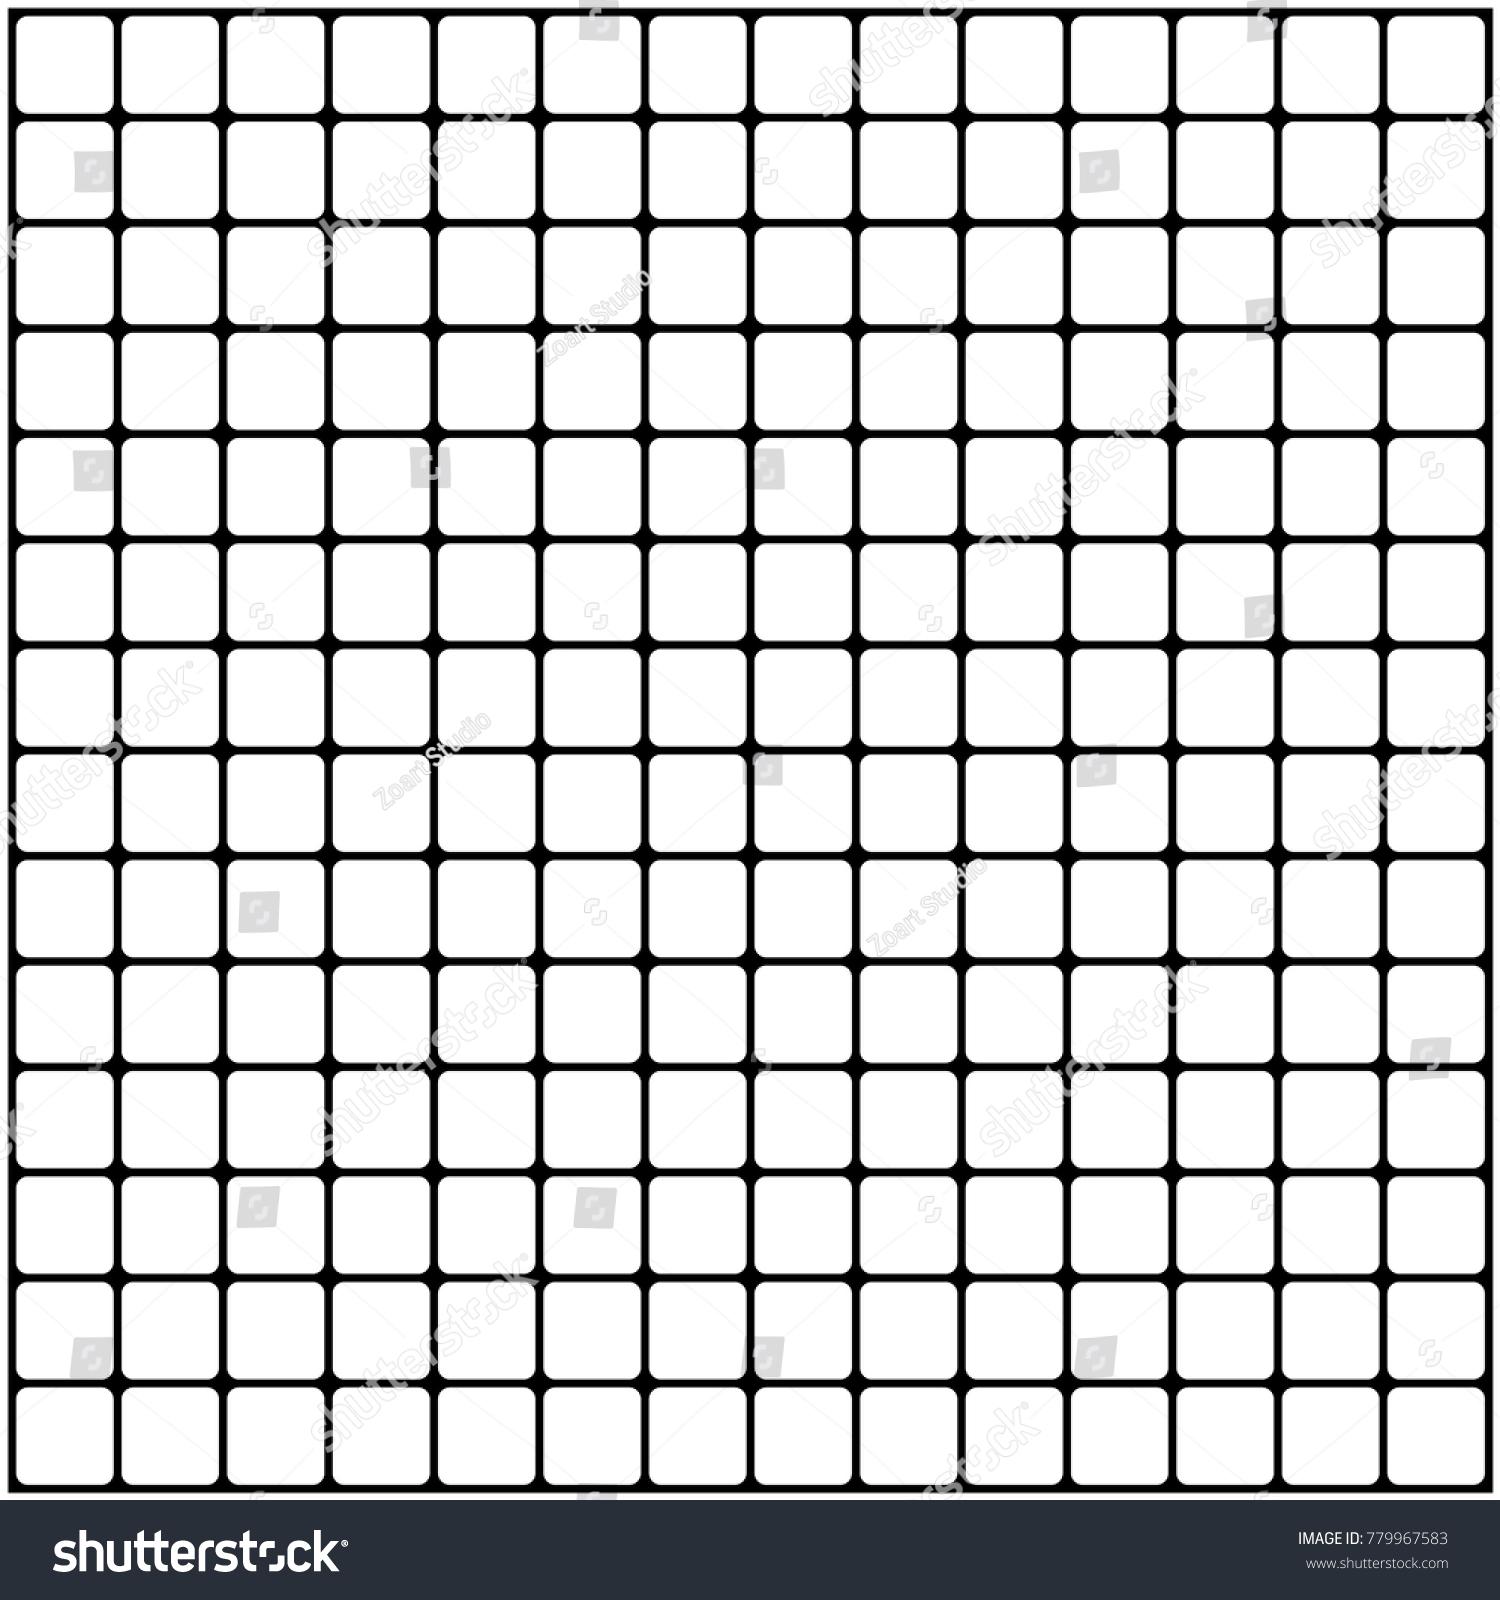 Cube Pattern Black Mesh Transparent Backgrounds Stock Vector ...